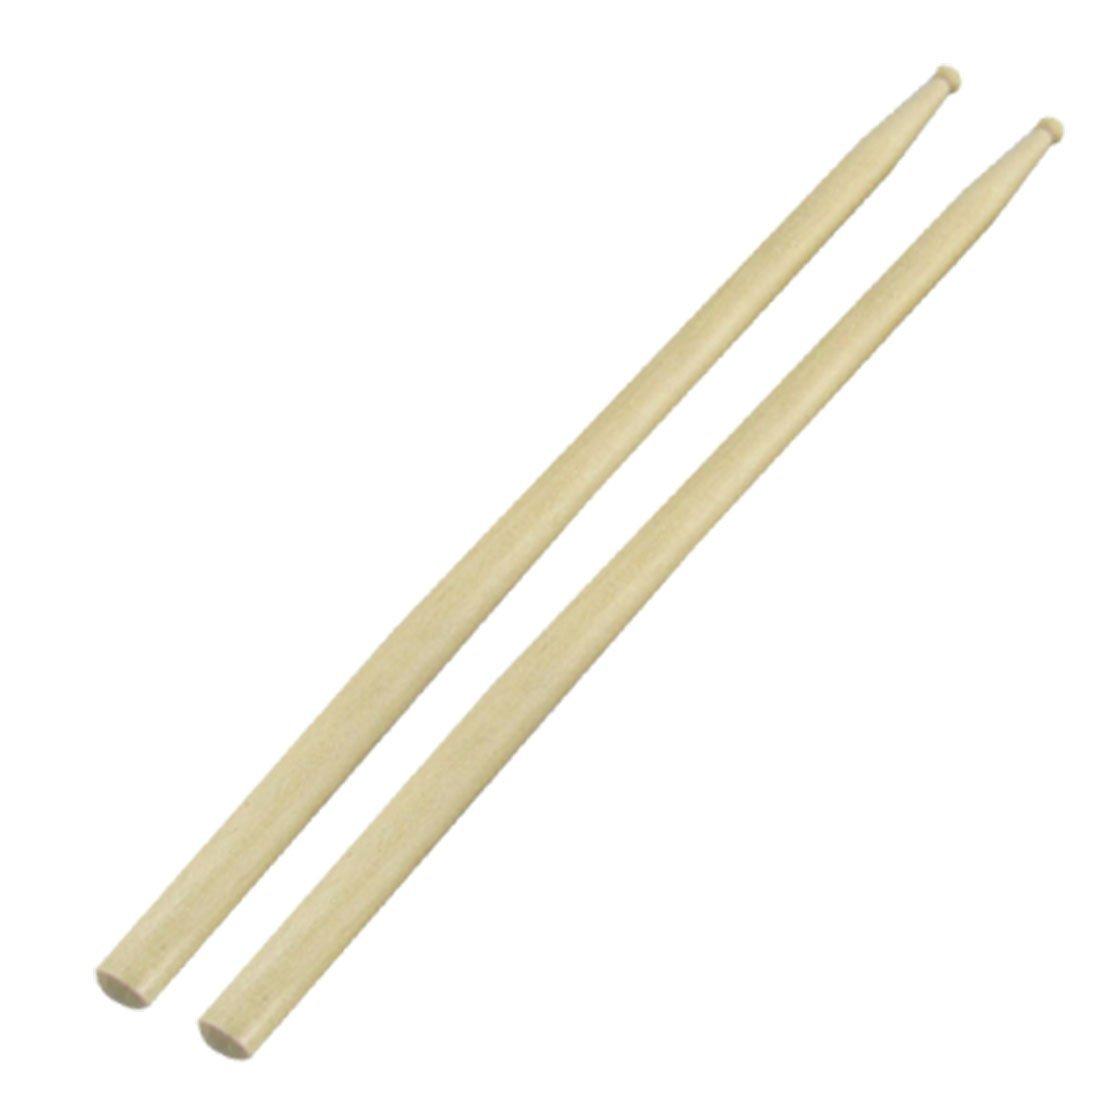 Beginner Musical Pair Wooden 5A Drumsticks Drum Sticks SODIAL(R) BCG329773